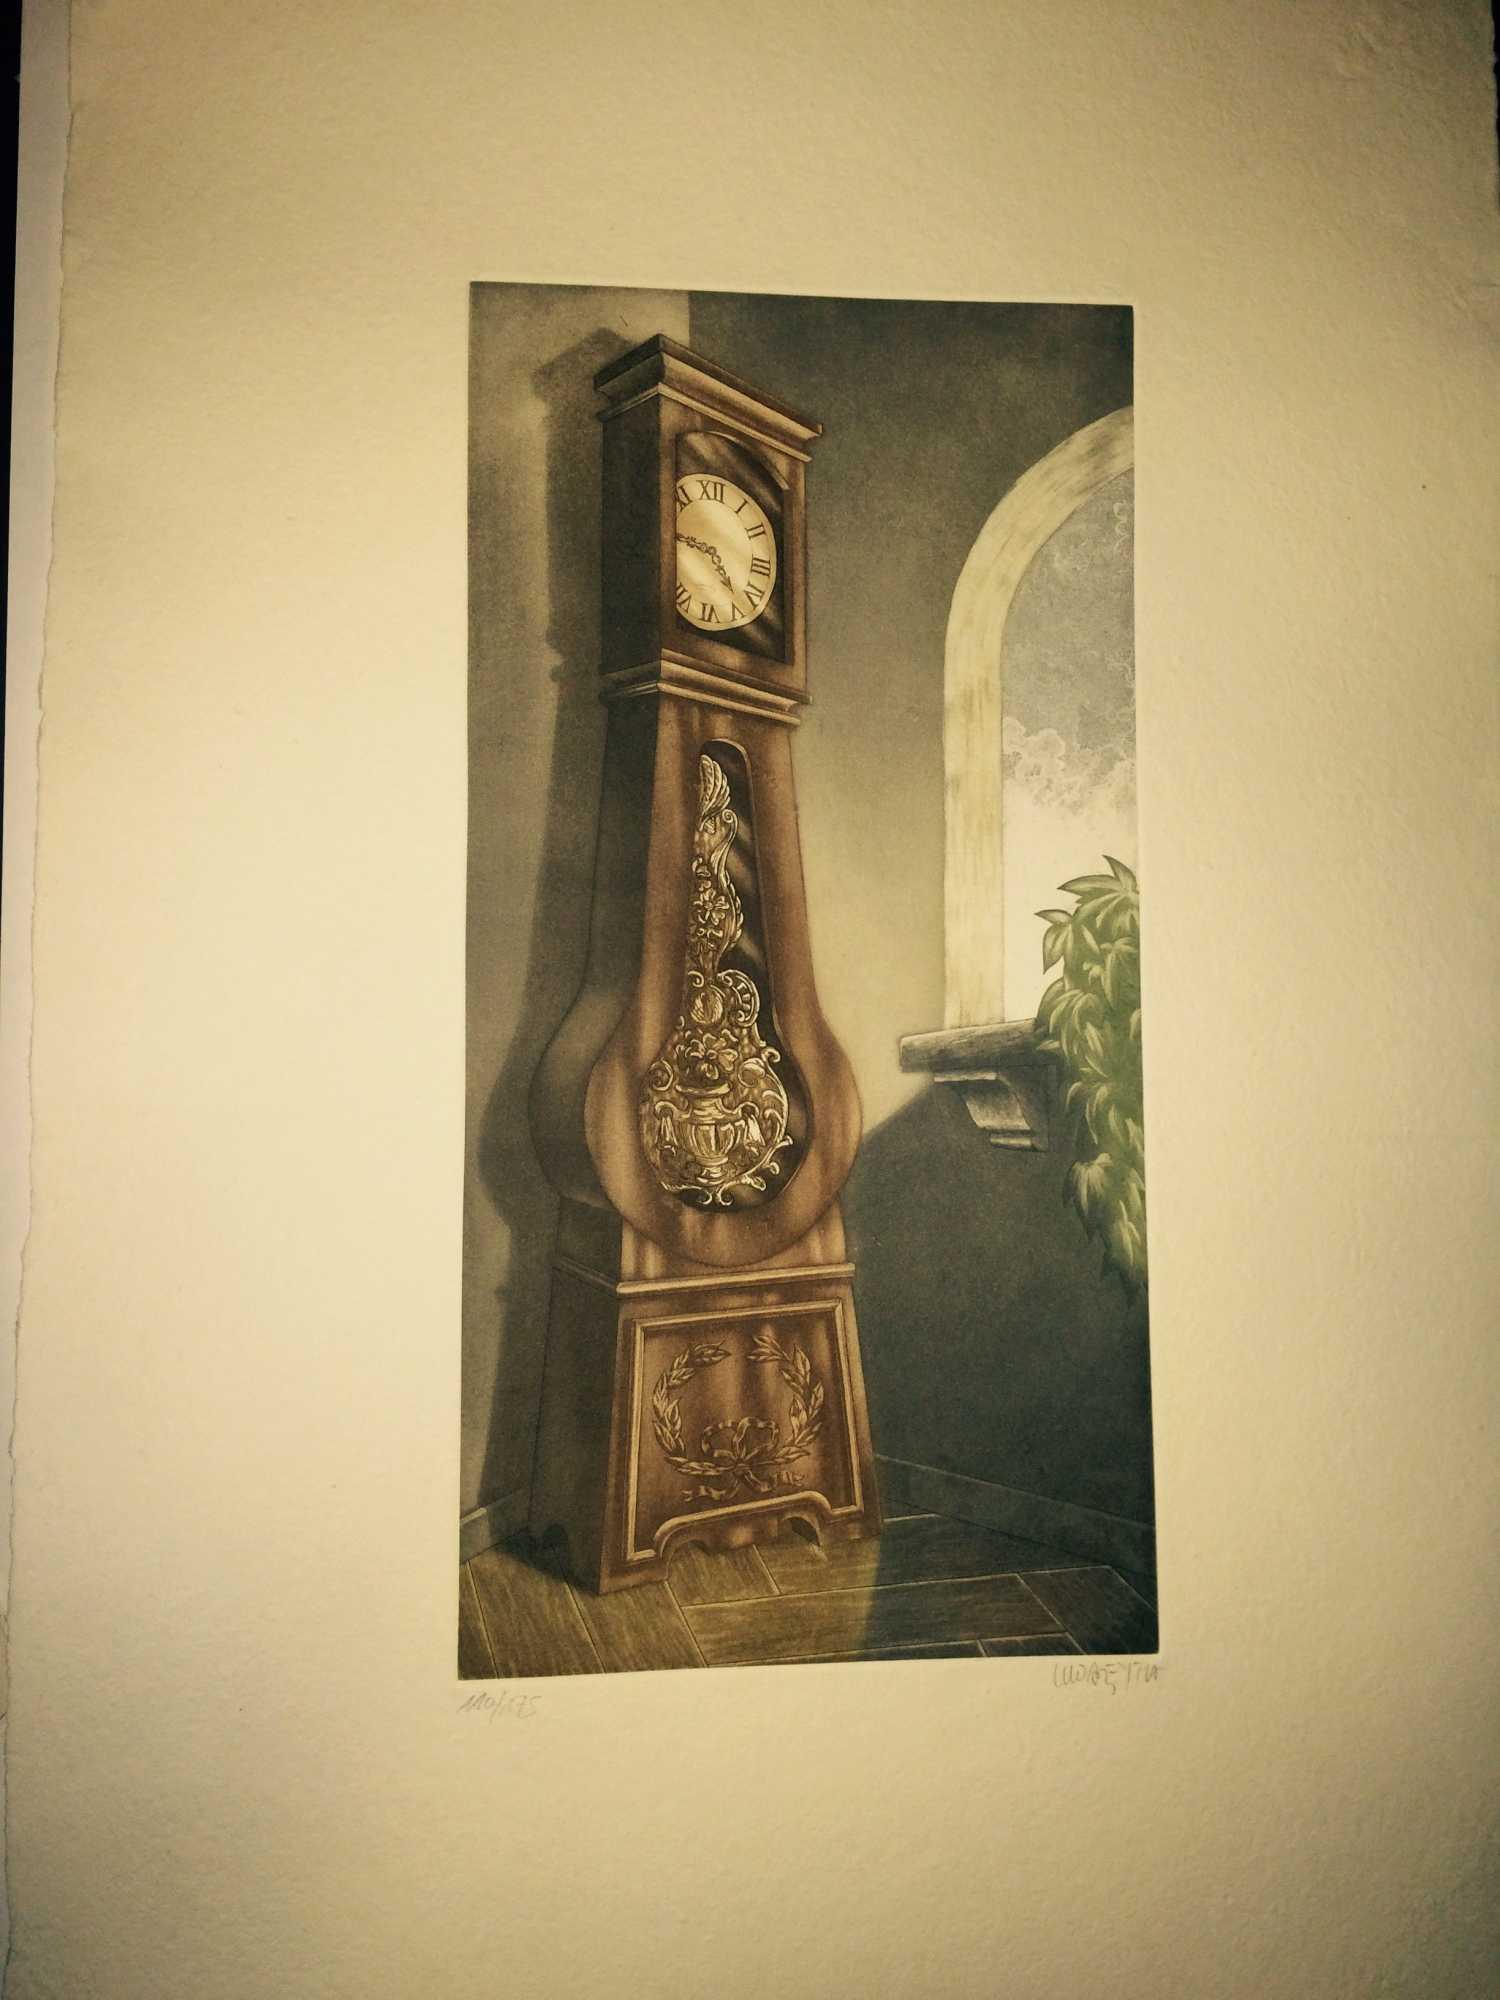 Reloj De Pie En Lateral